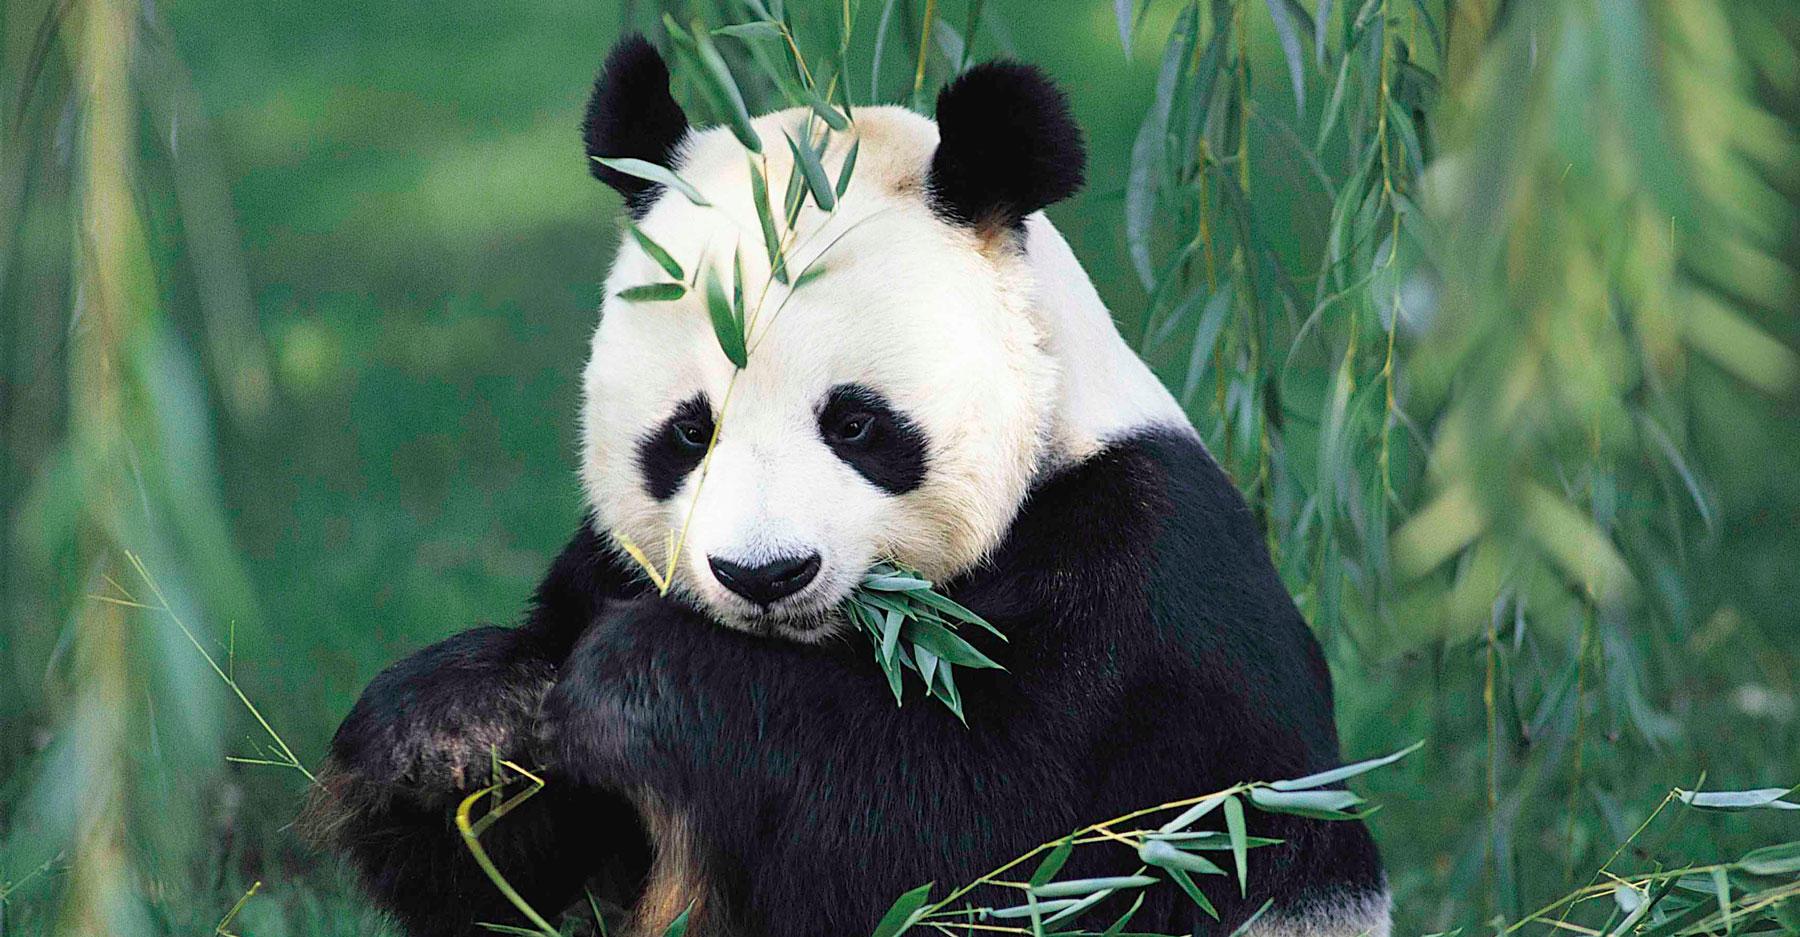 Giant panda (ALLUROPODA MELANOLEUCA) eating bamboo.